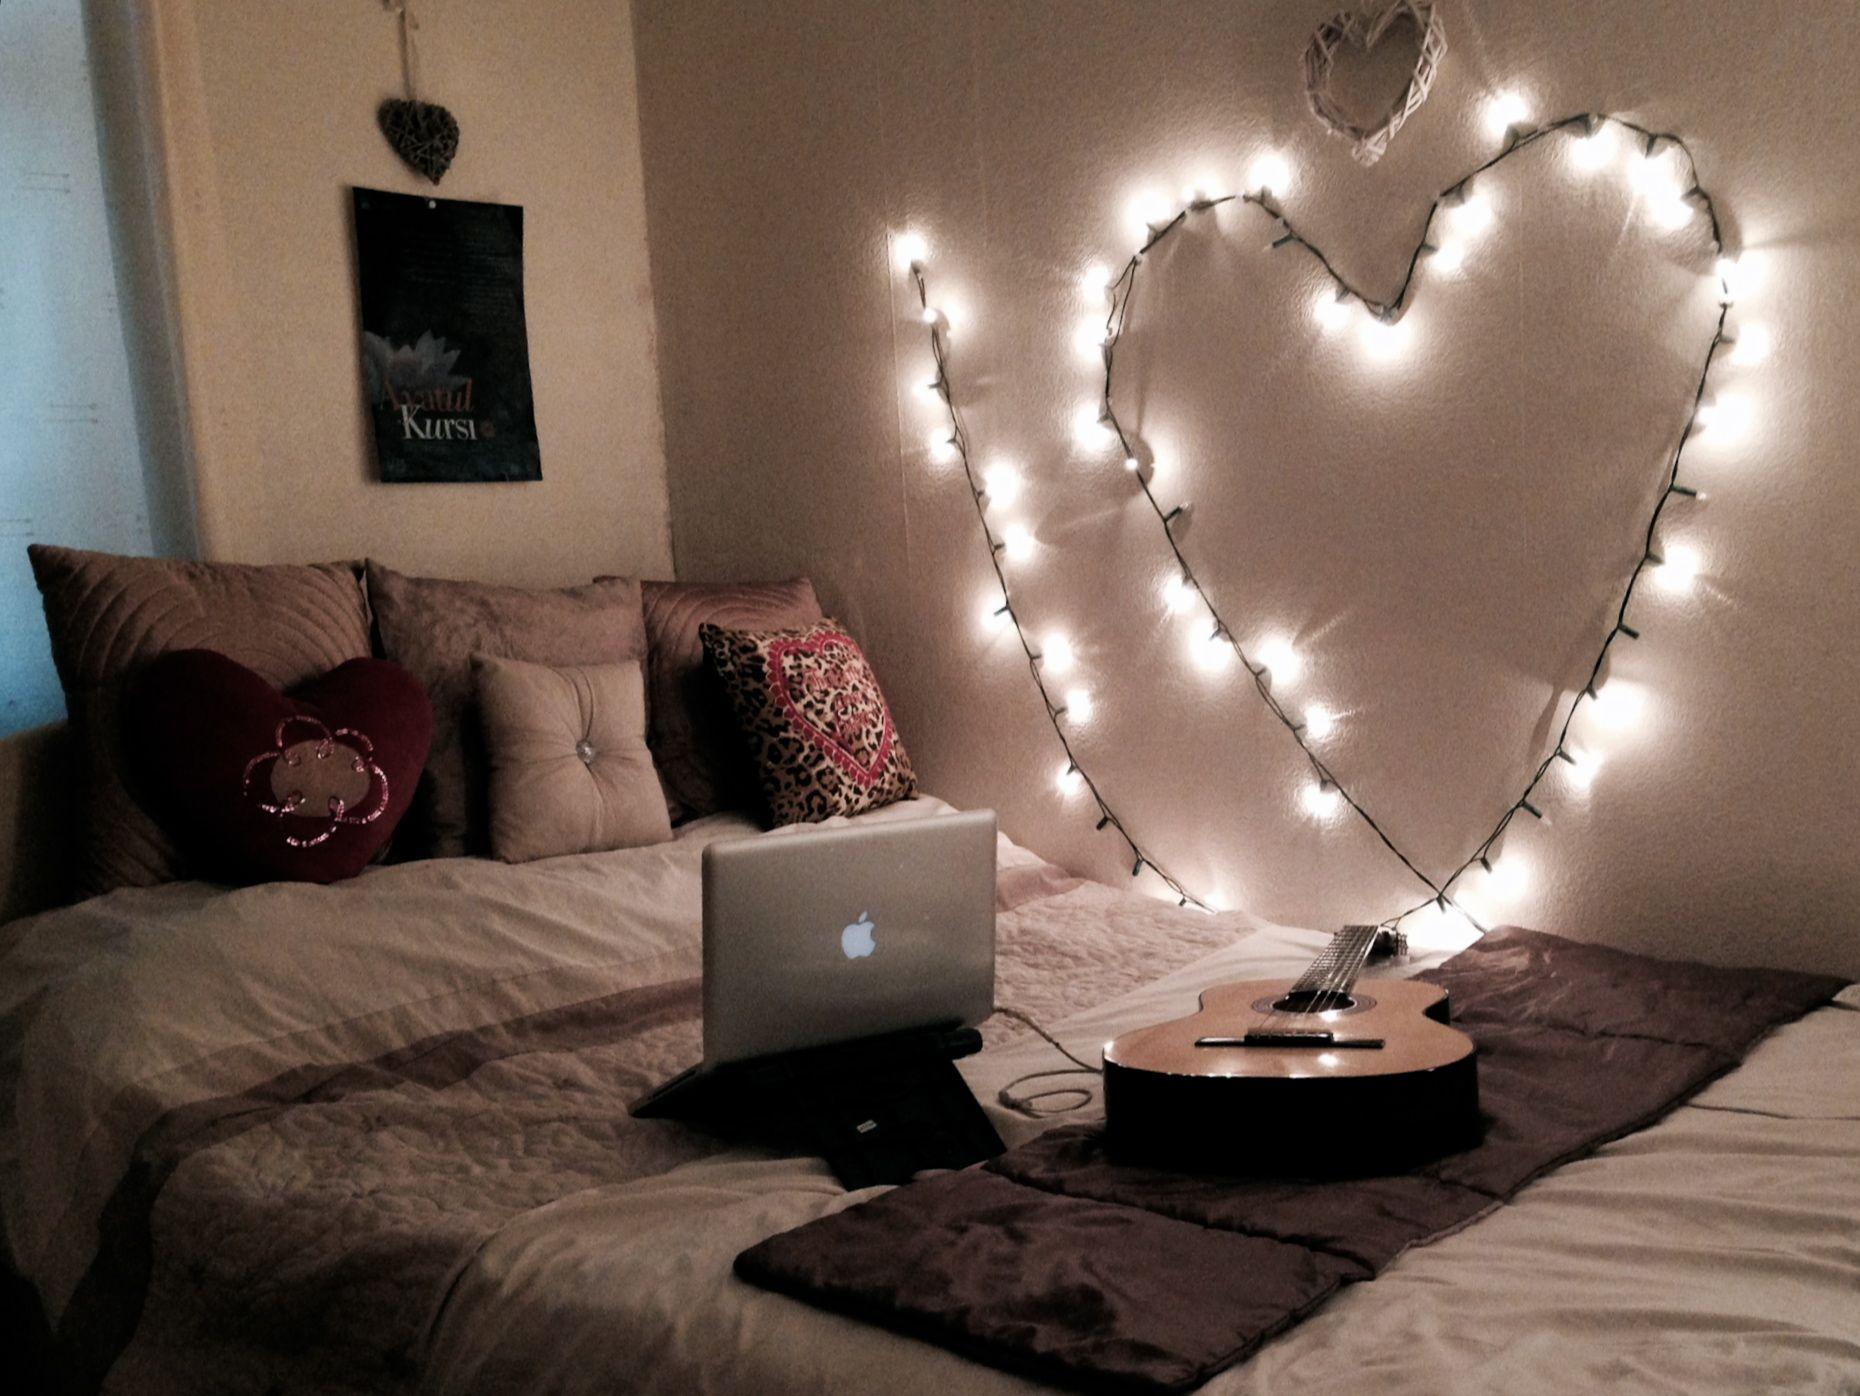 Pin On Project Life Romantic bedroom lighting ideas